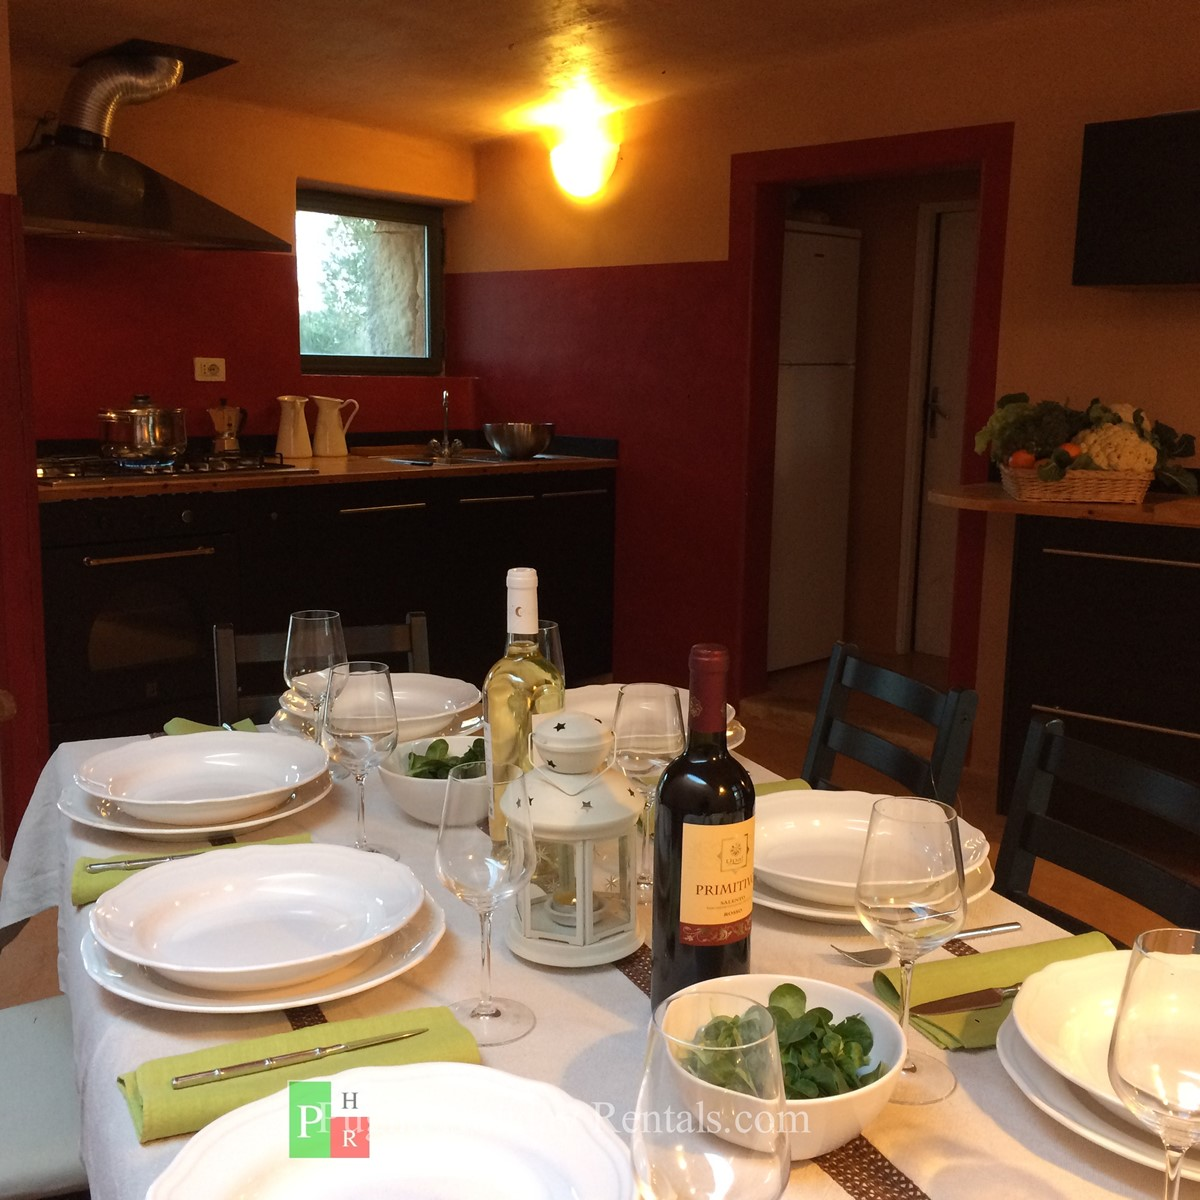 Trullo Terra Madre Kitchen Diner